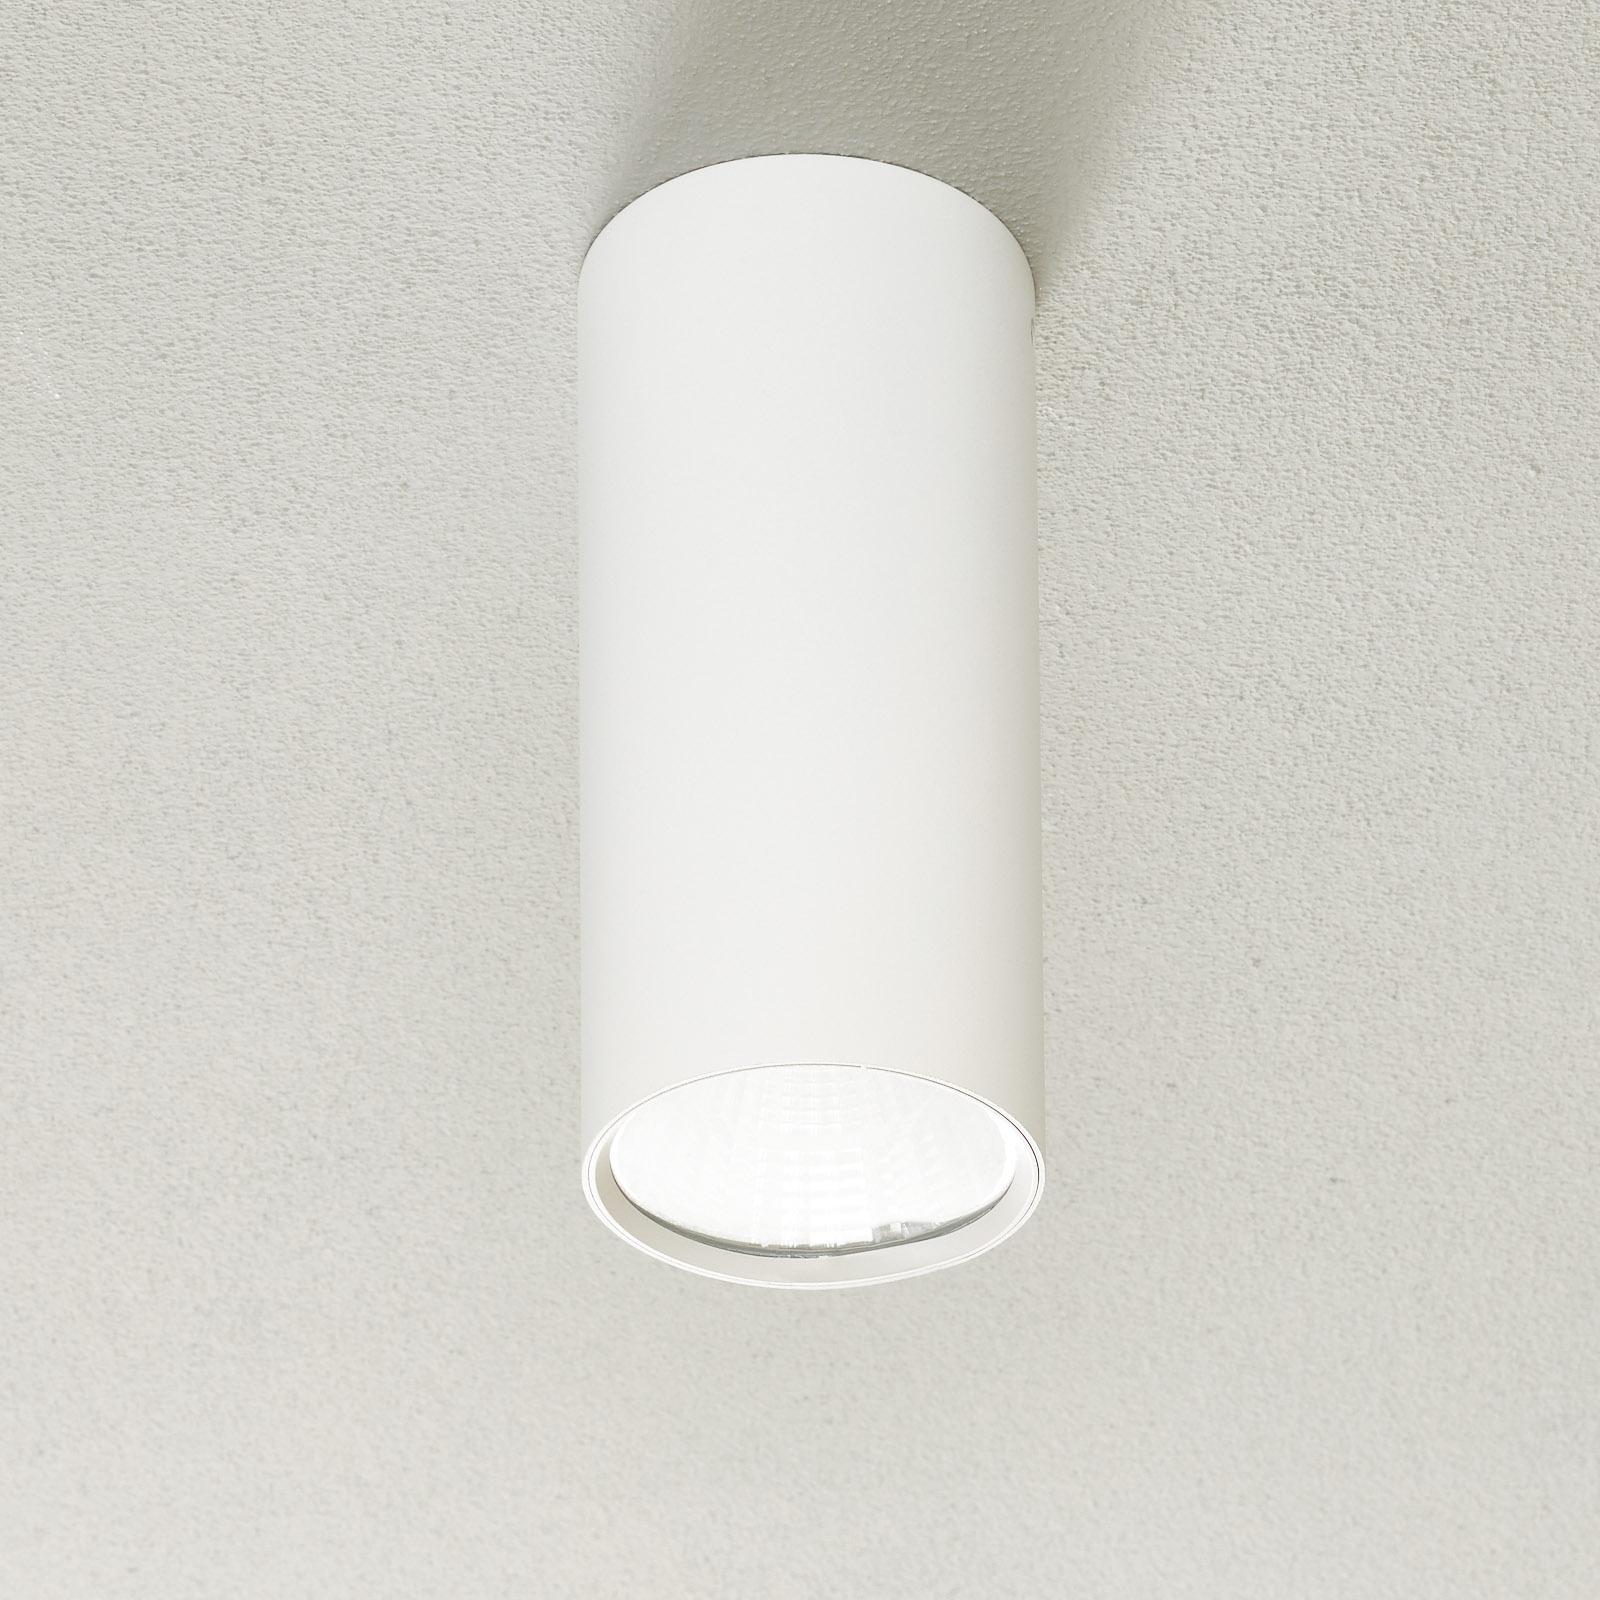 Lucande Takio LED downlight 2700K Ø10cm wit